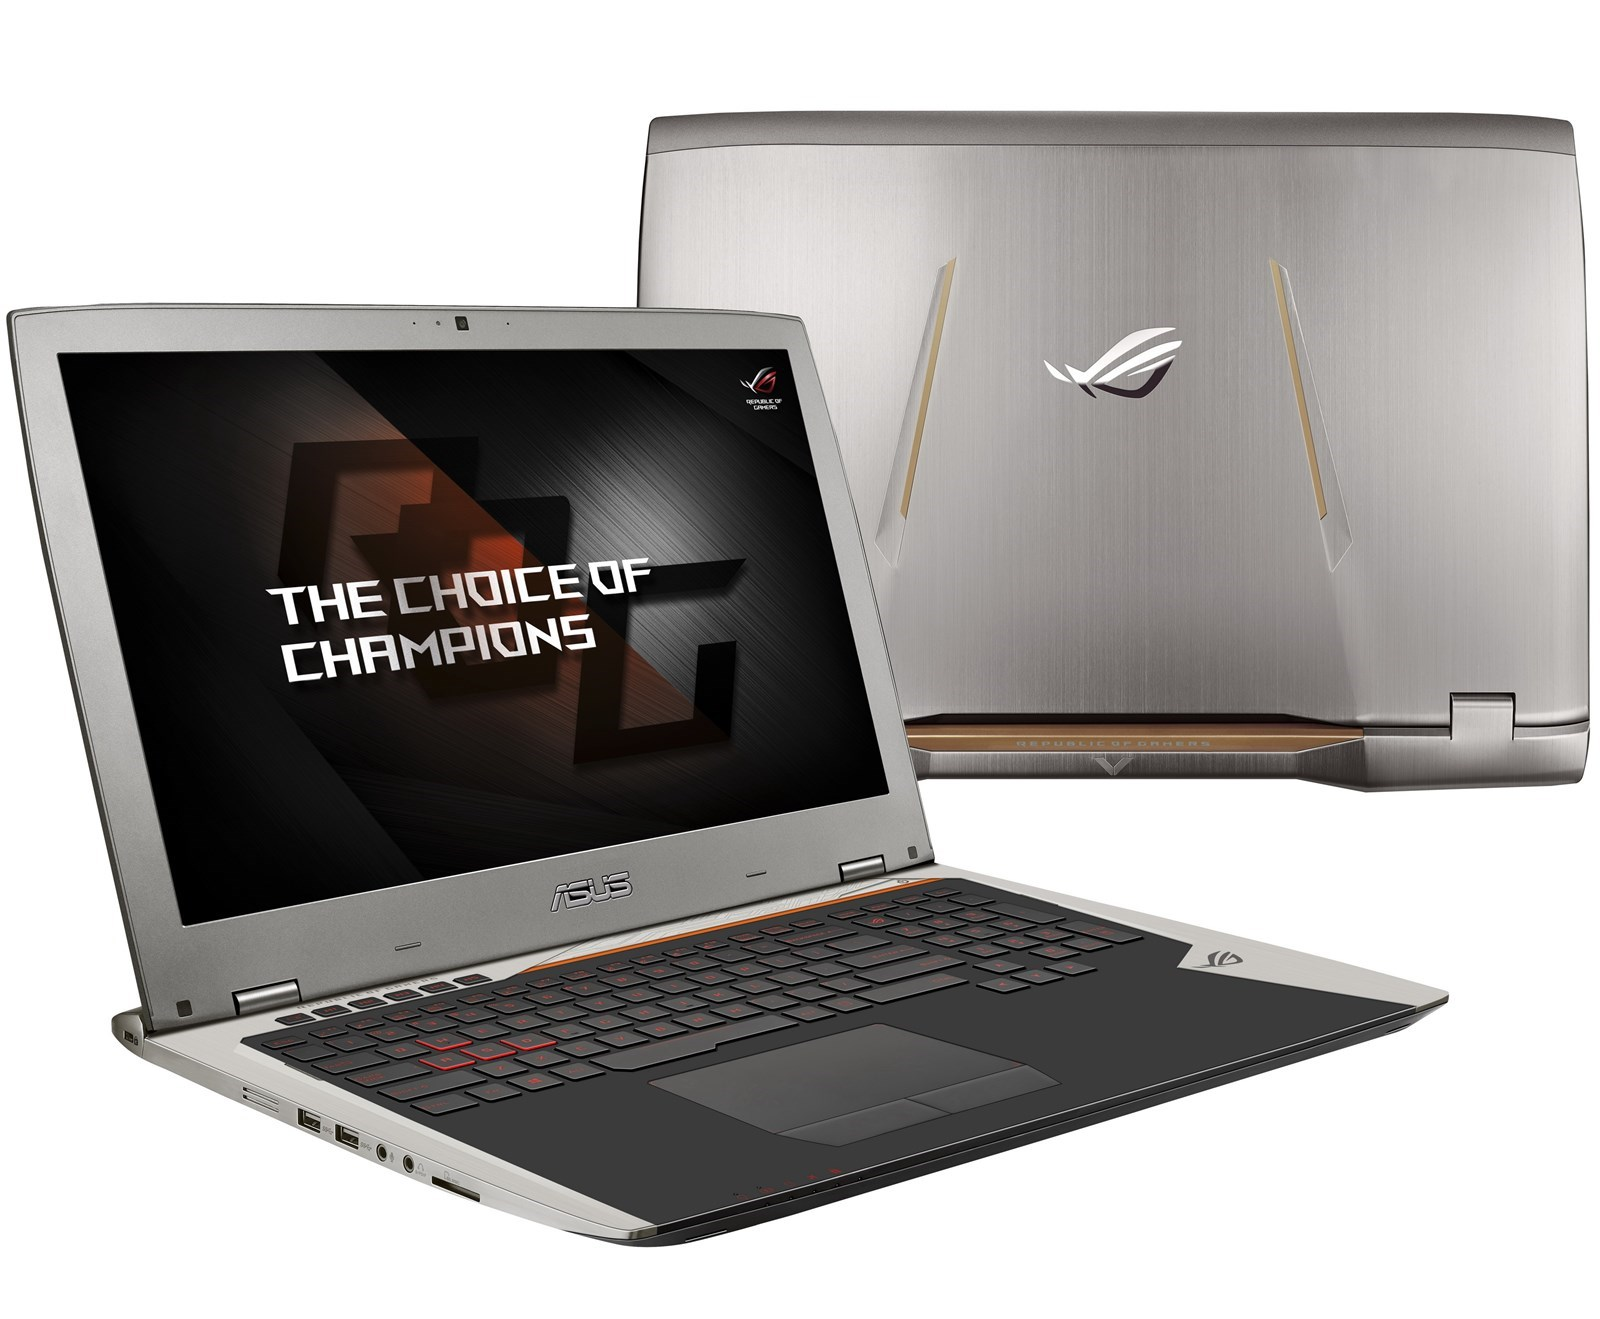 Cross-bord:- ASUS ROG G701VI-XB78K 17.3 inch Gaming Laptop (Intel Core i7-6820HK, 64GB SDRAM, 1TB SSD, Windows 10)